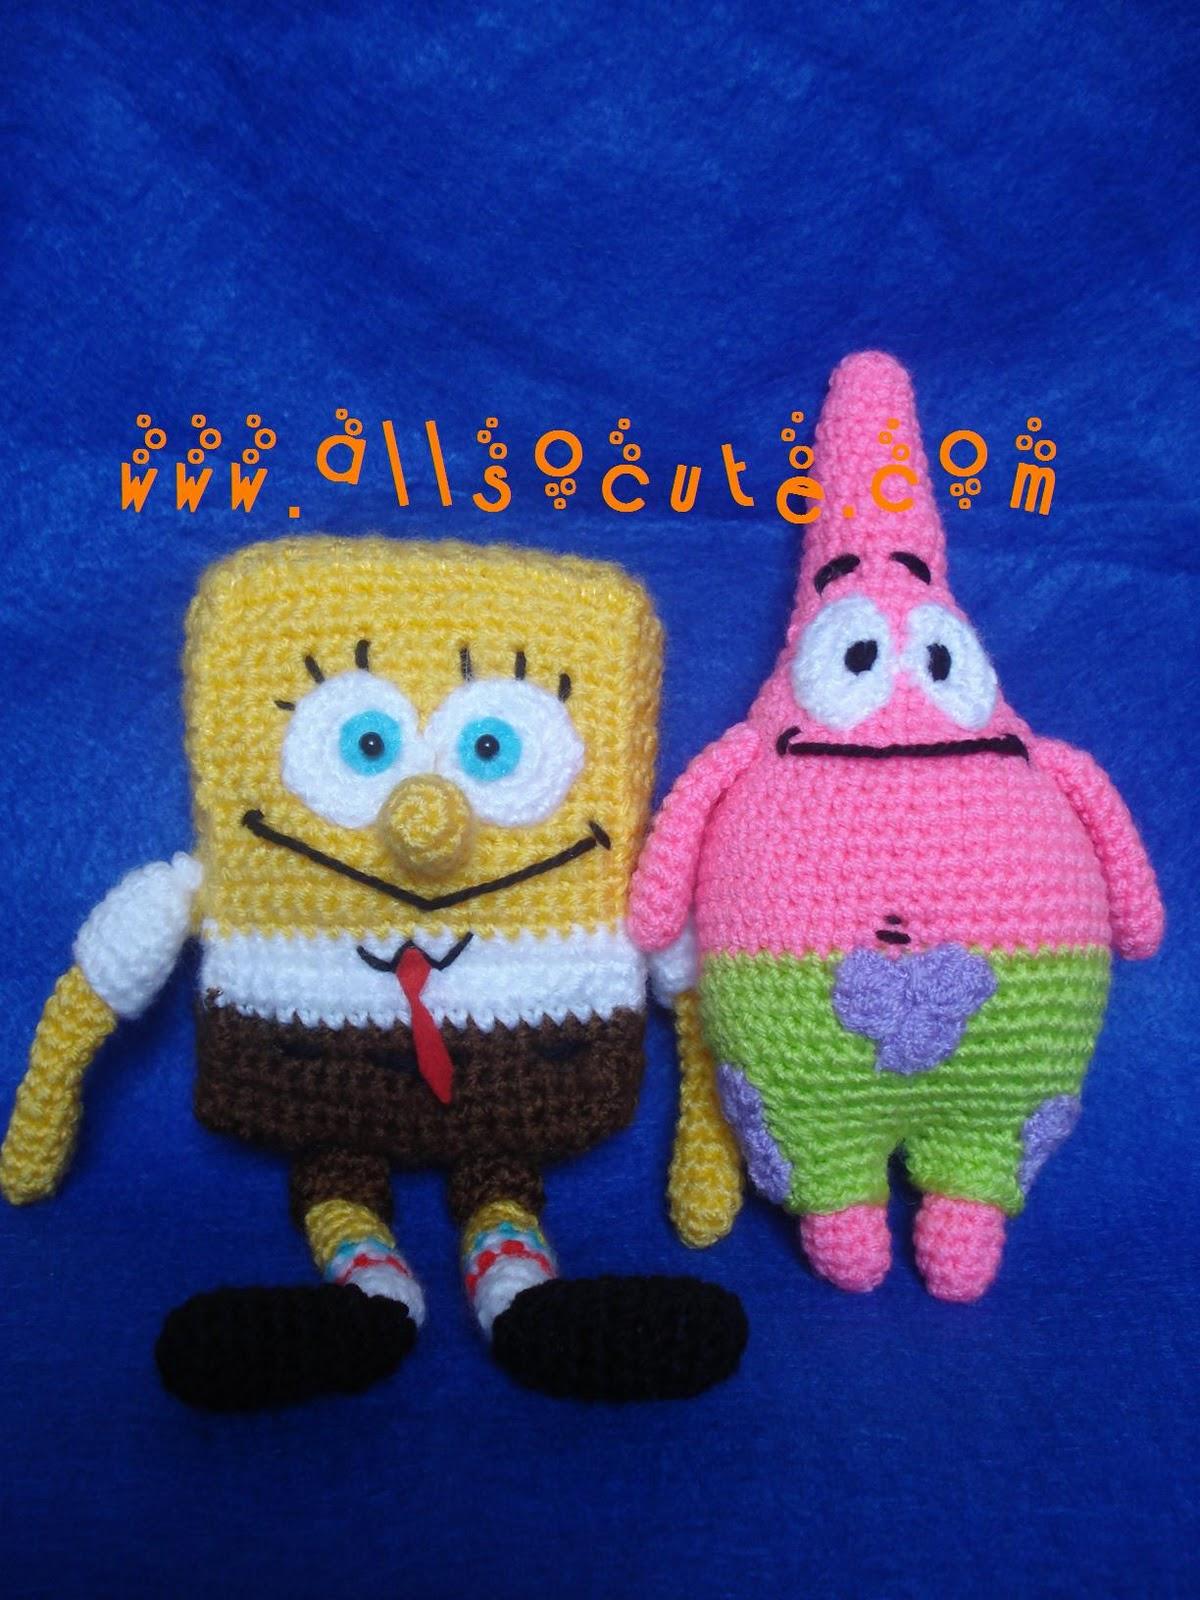 Patrick Star Amigurumi Pattern : AllSoCute Amigurumis: Amigurumi Patrick Star